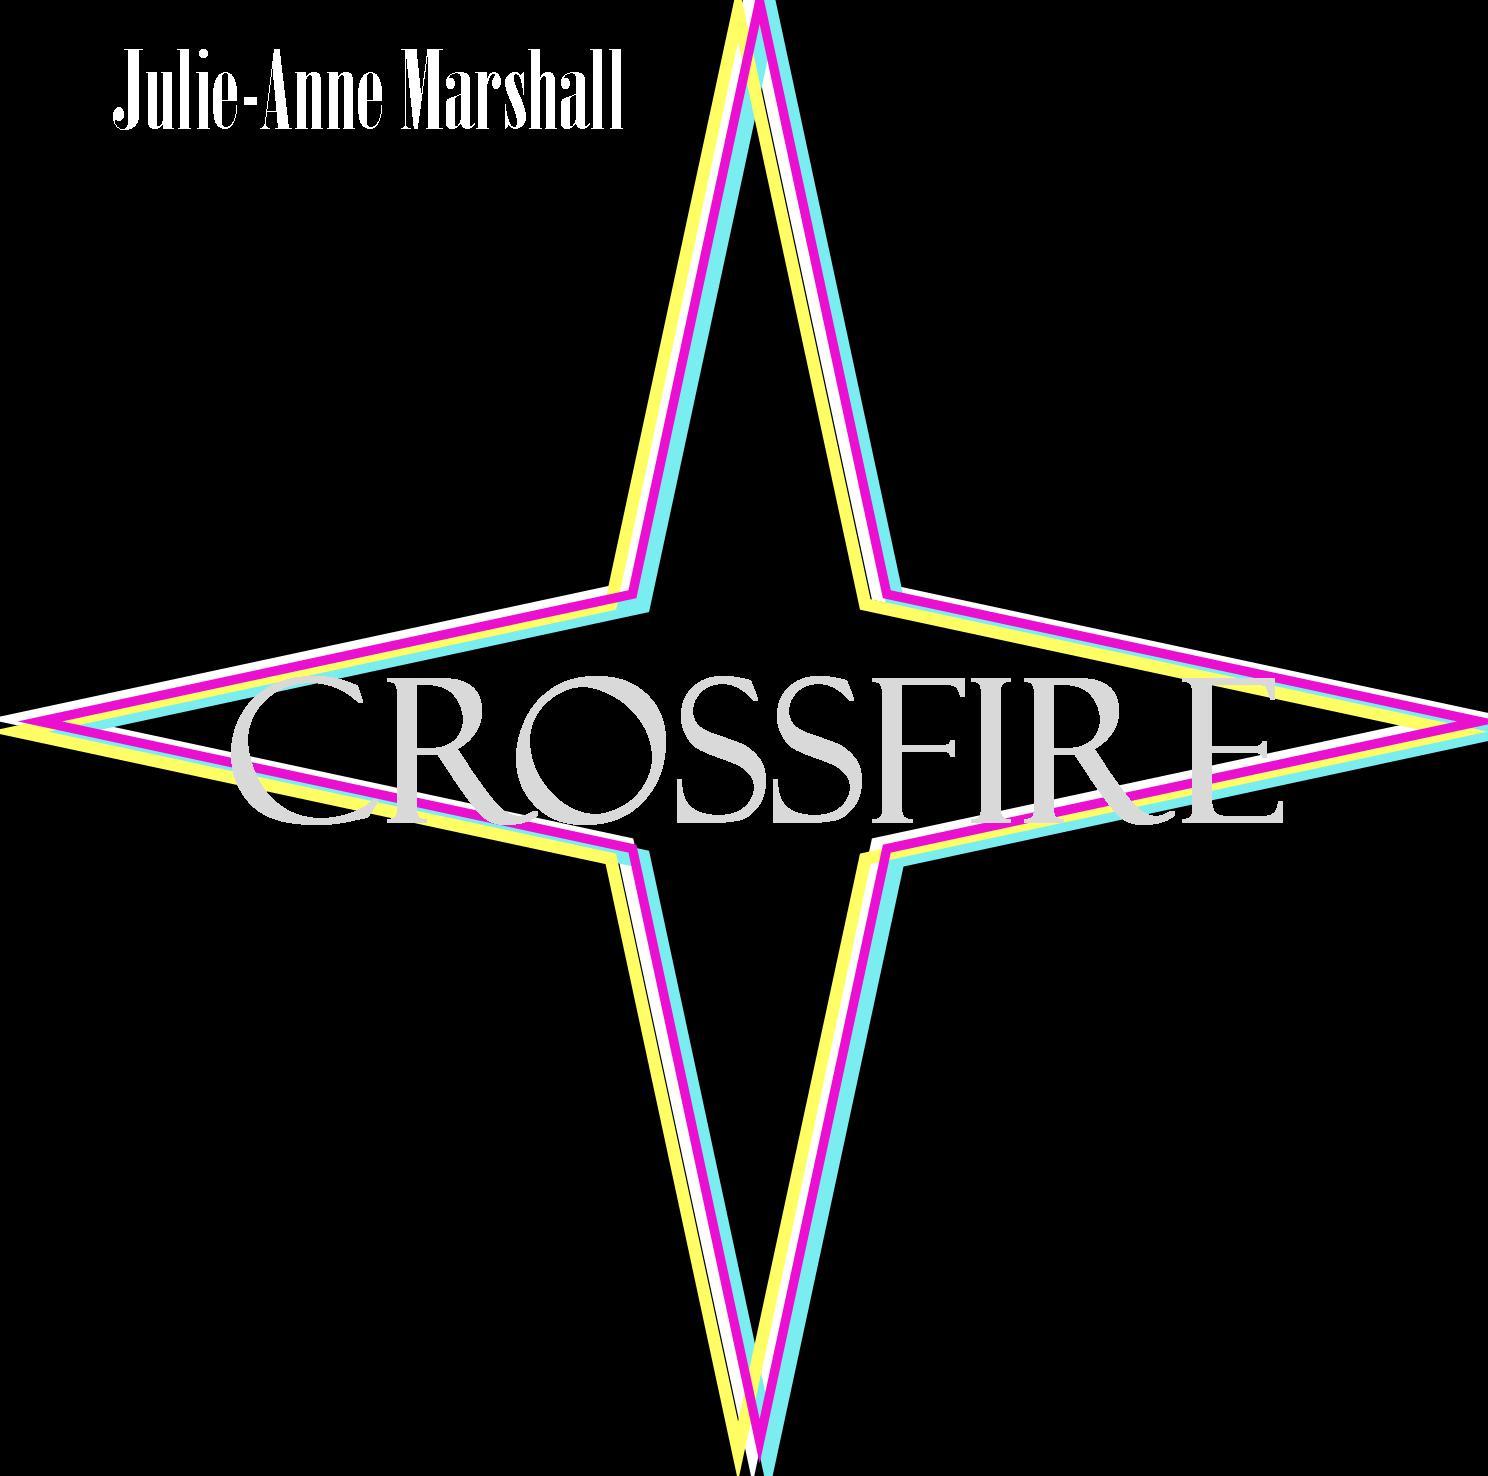 Crossfire Single Cover